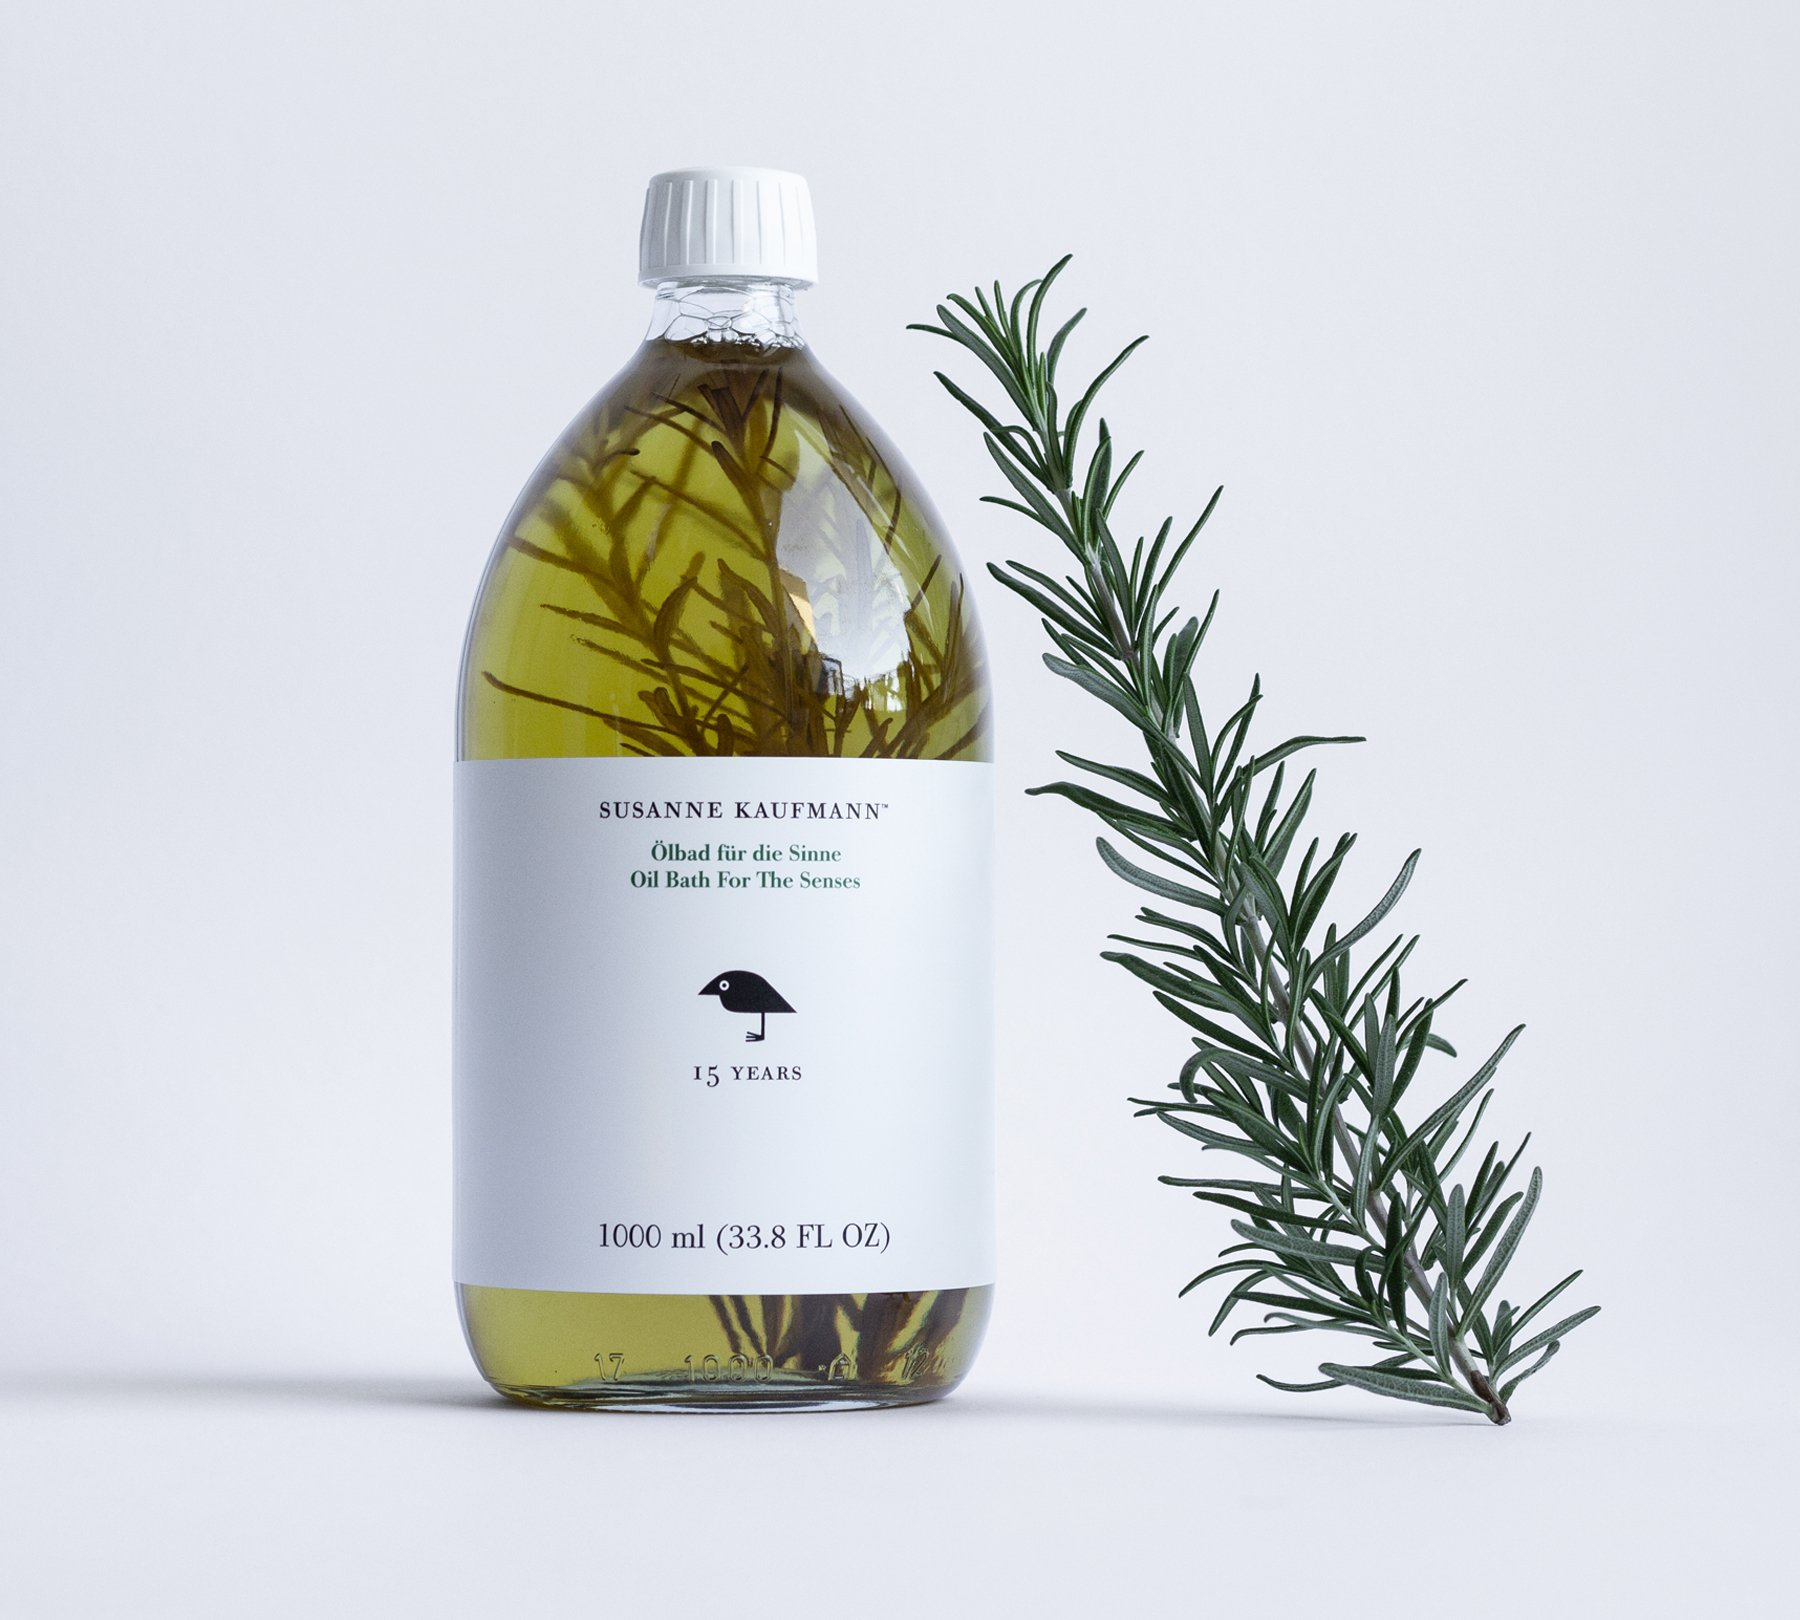 Oil Bath For The Senses  Susanne Kaufmann